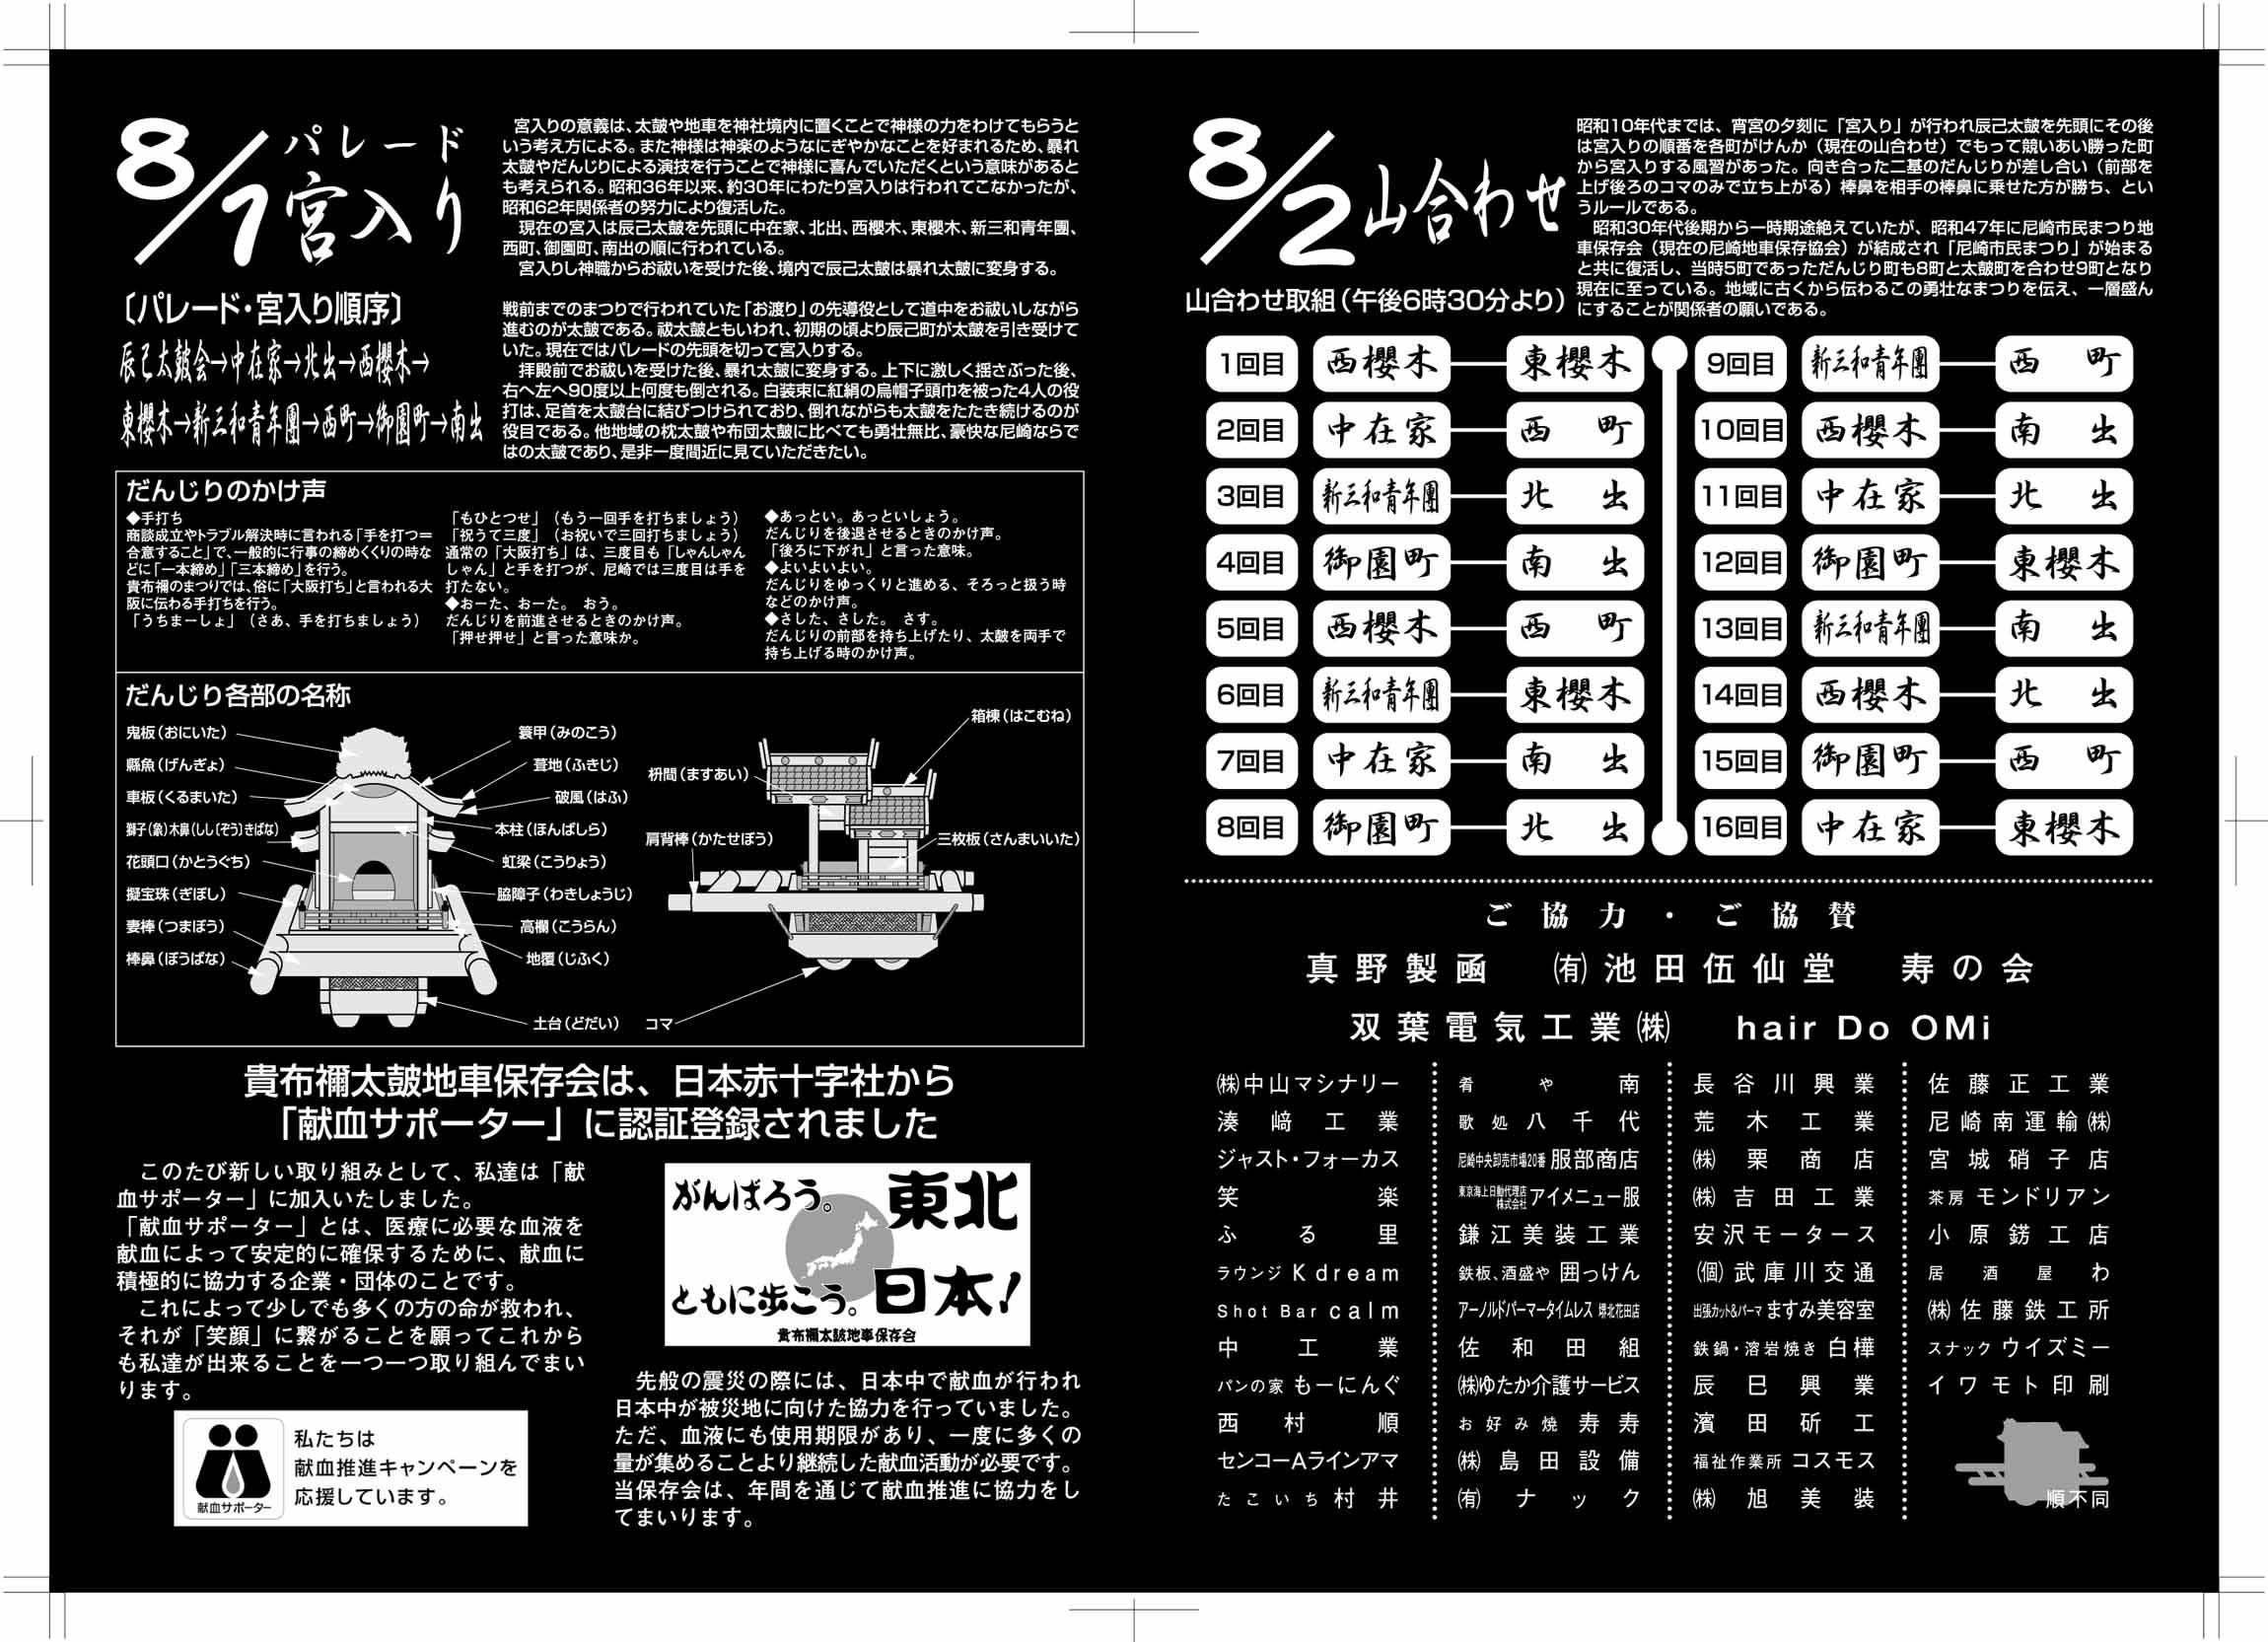 H23pamphlet-b.jpg